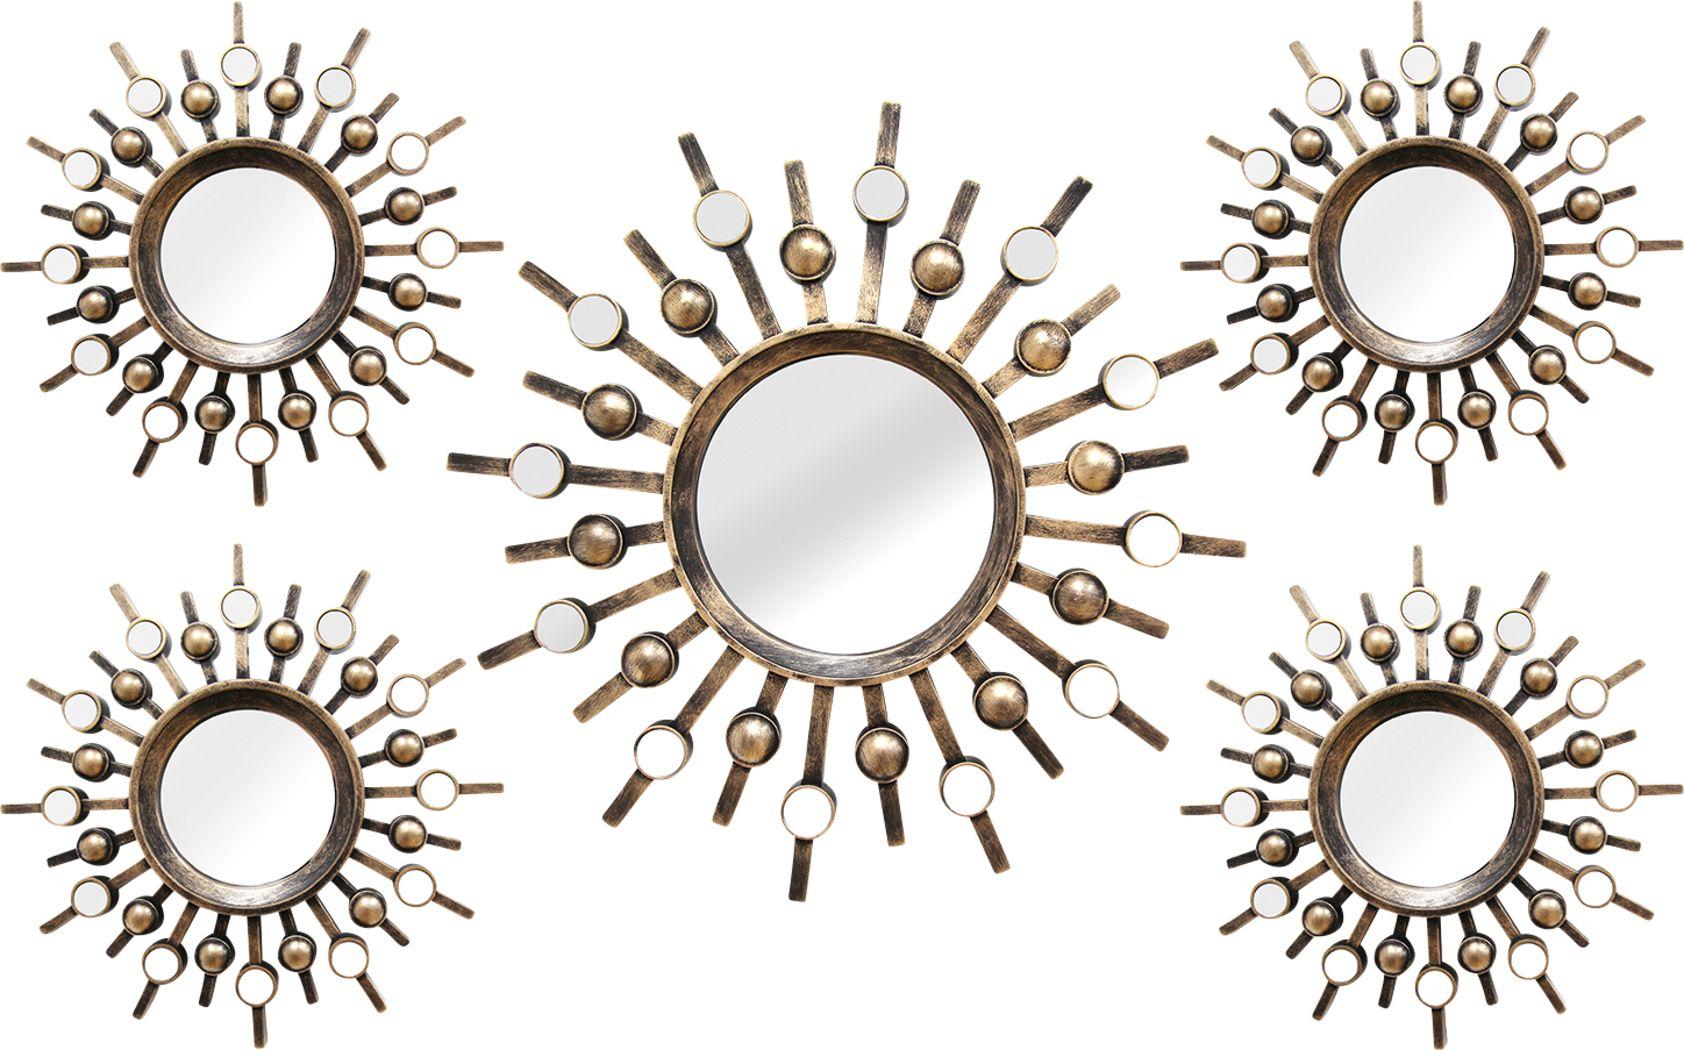 Super Burst Gold Mirrors Set of 5